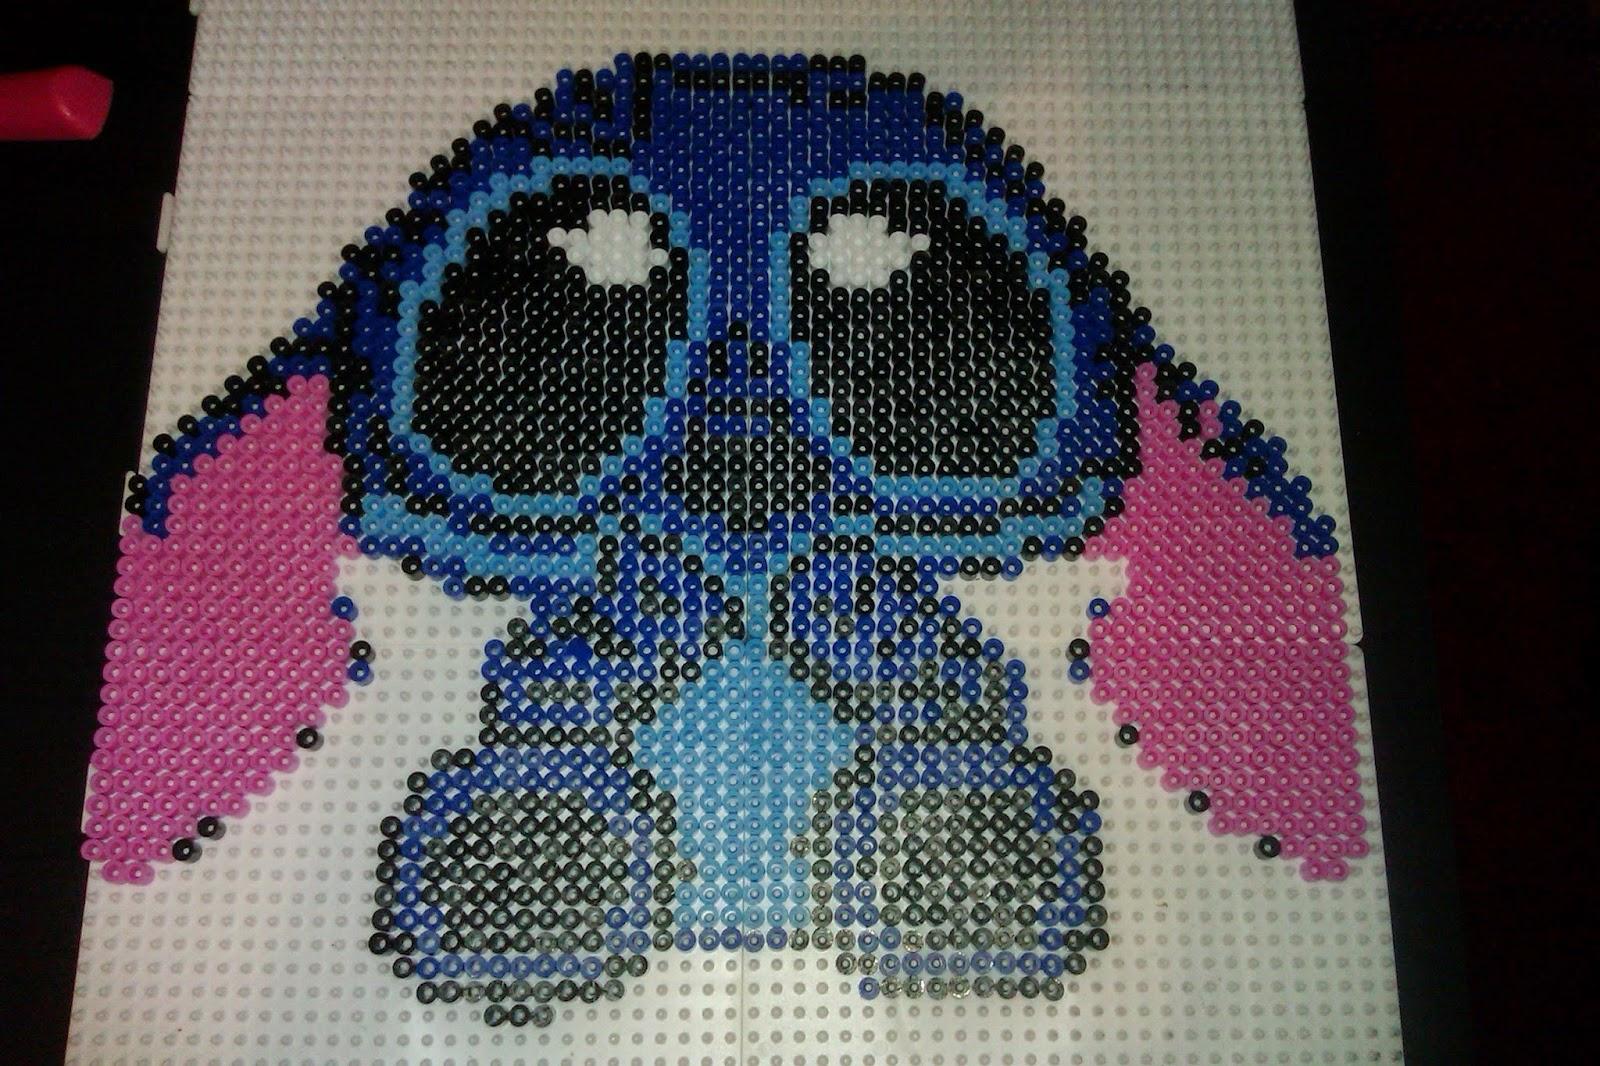 Pixel Art En Perle Hama Deviantart Bébé Stitch En Perle Hama